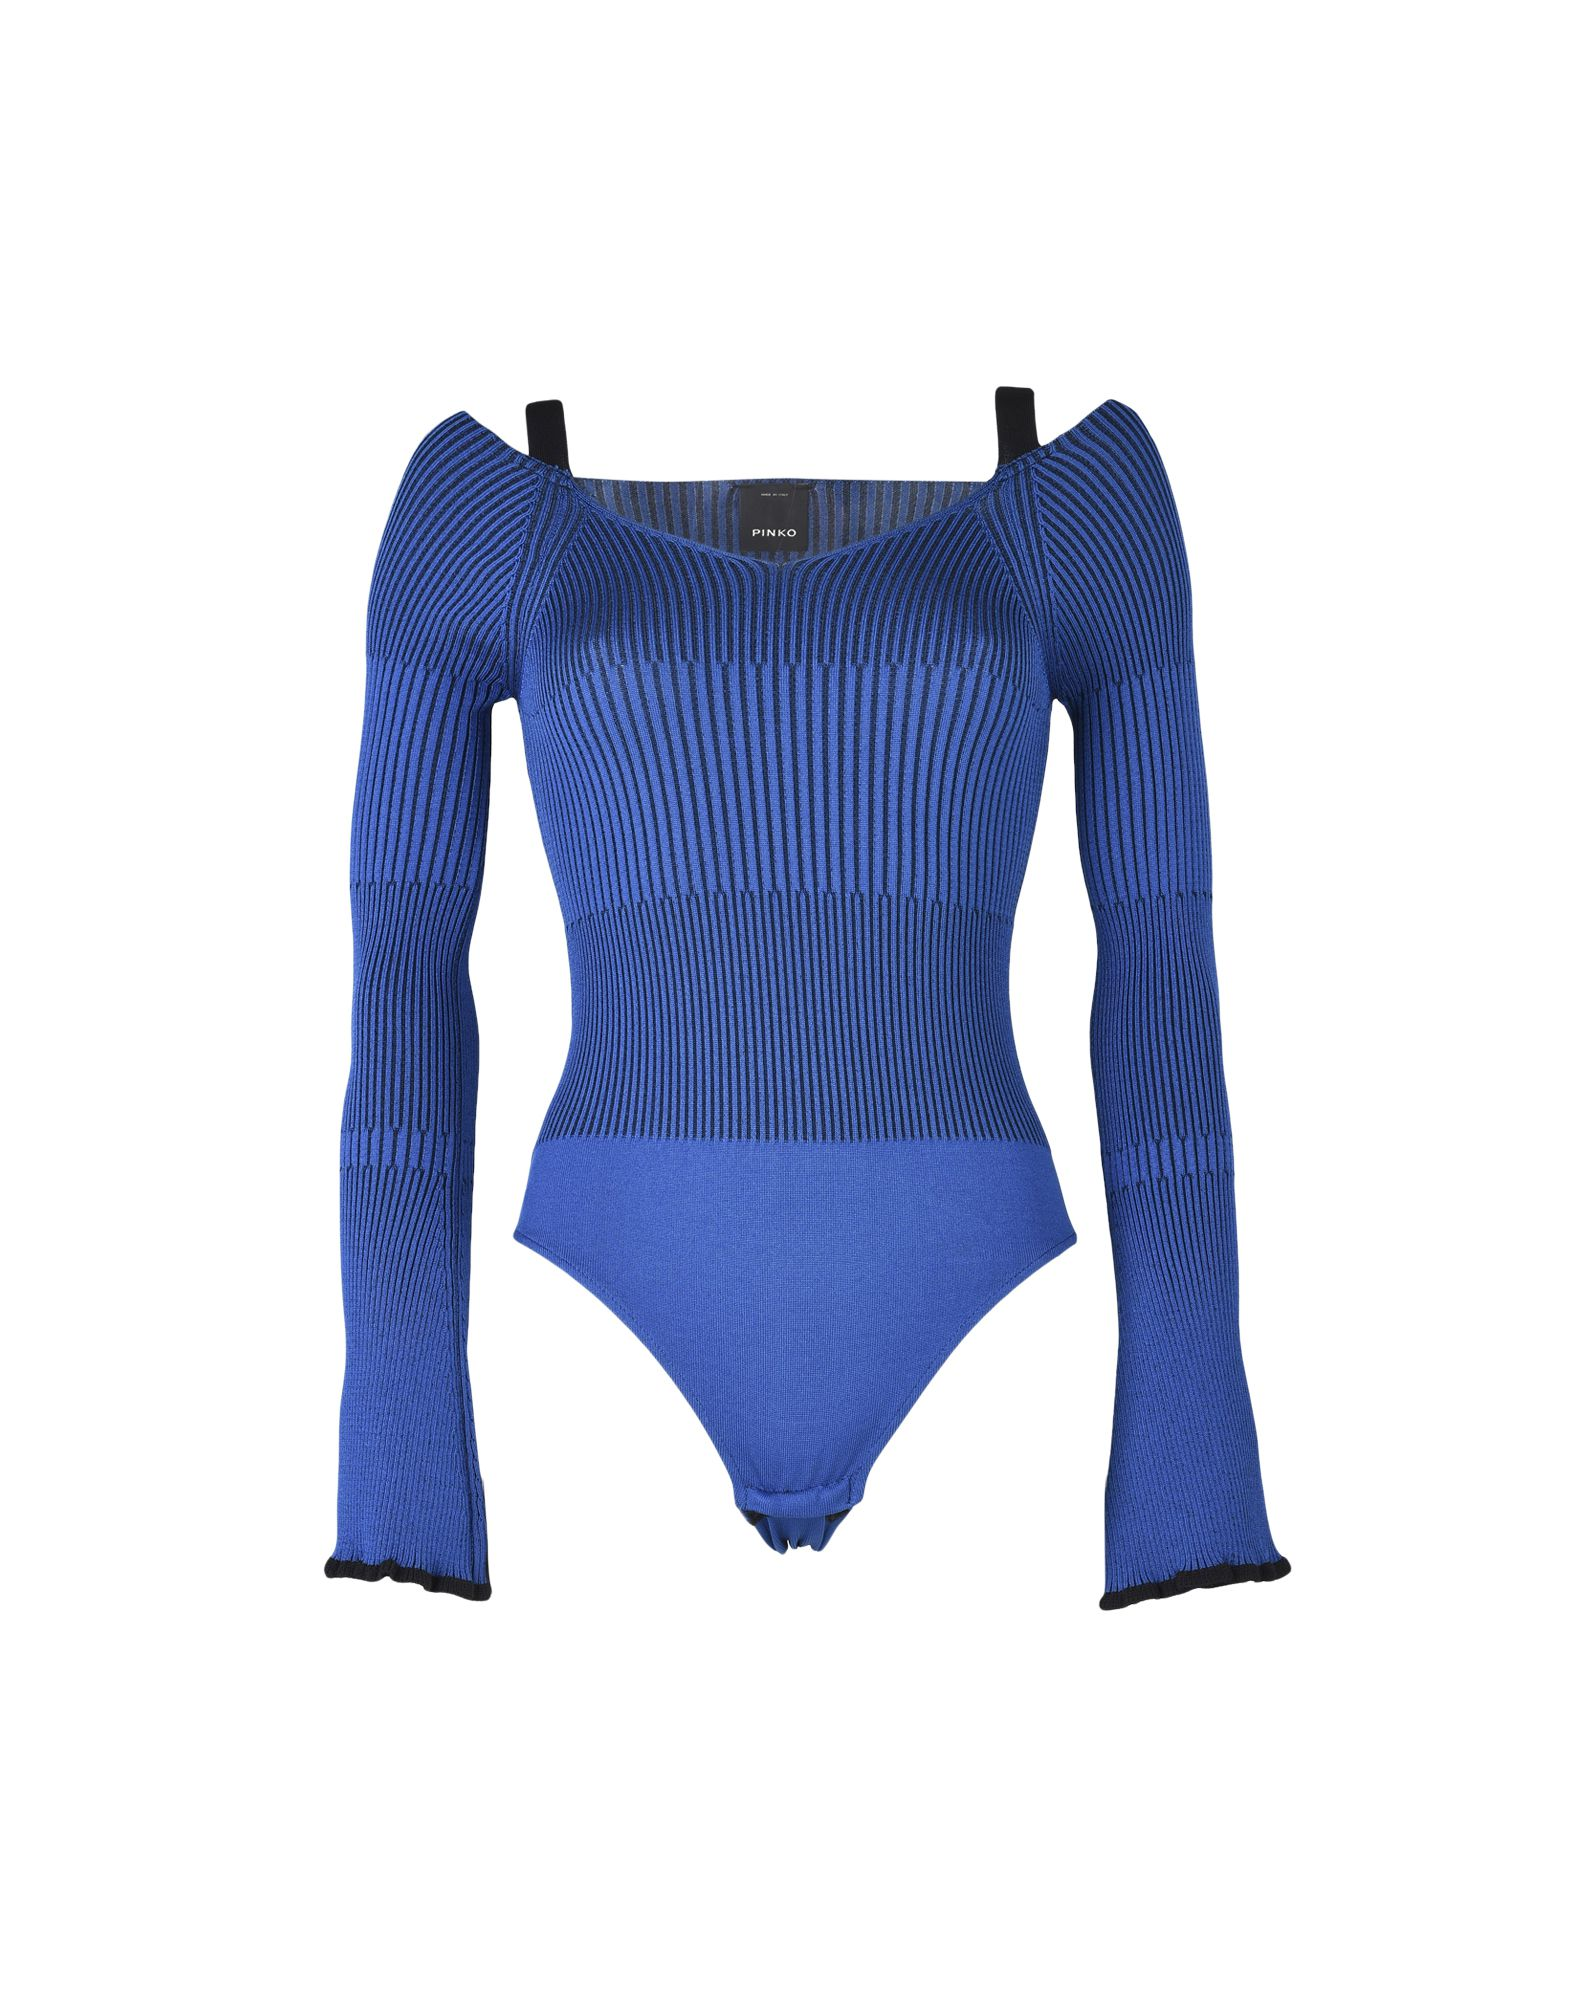 Pullover Pinko Donna - Acquista online su KMz2Mcu68D